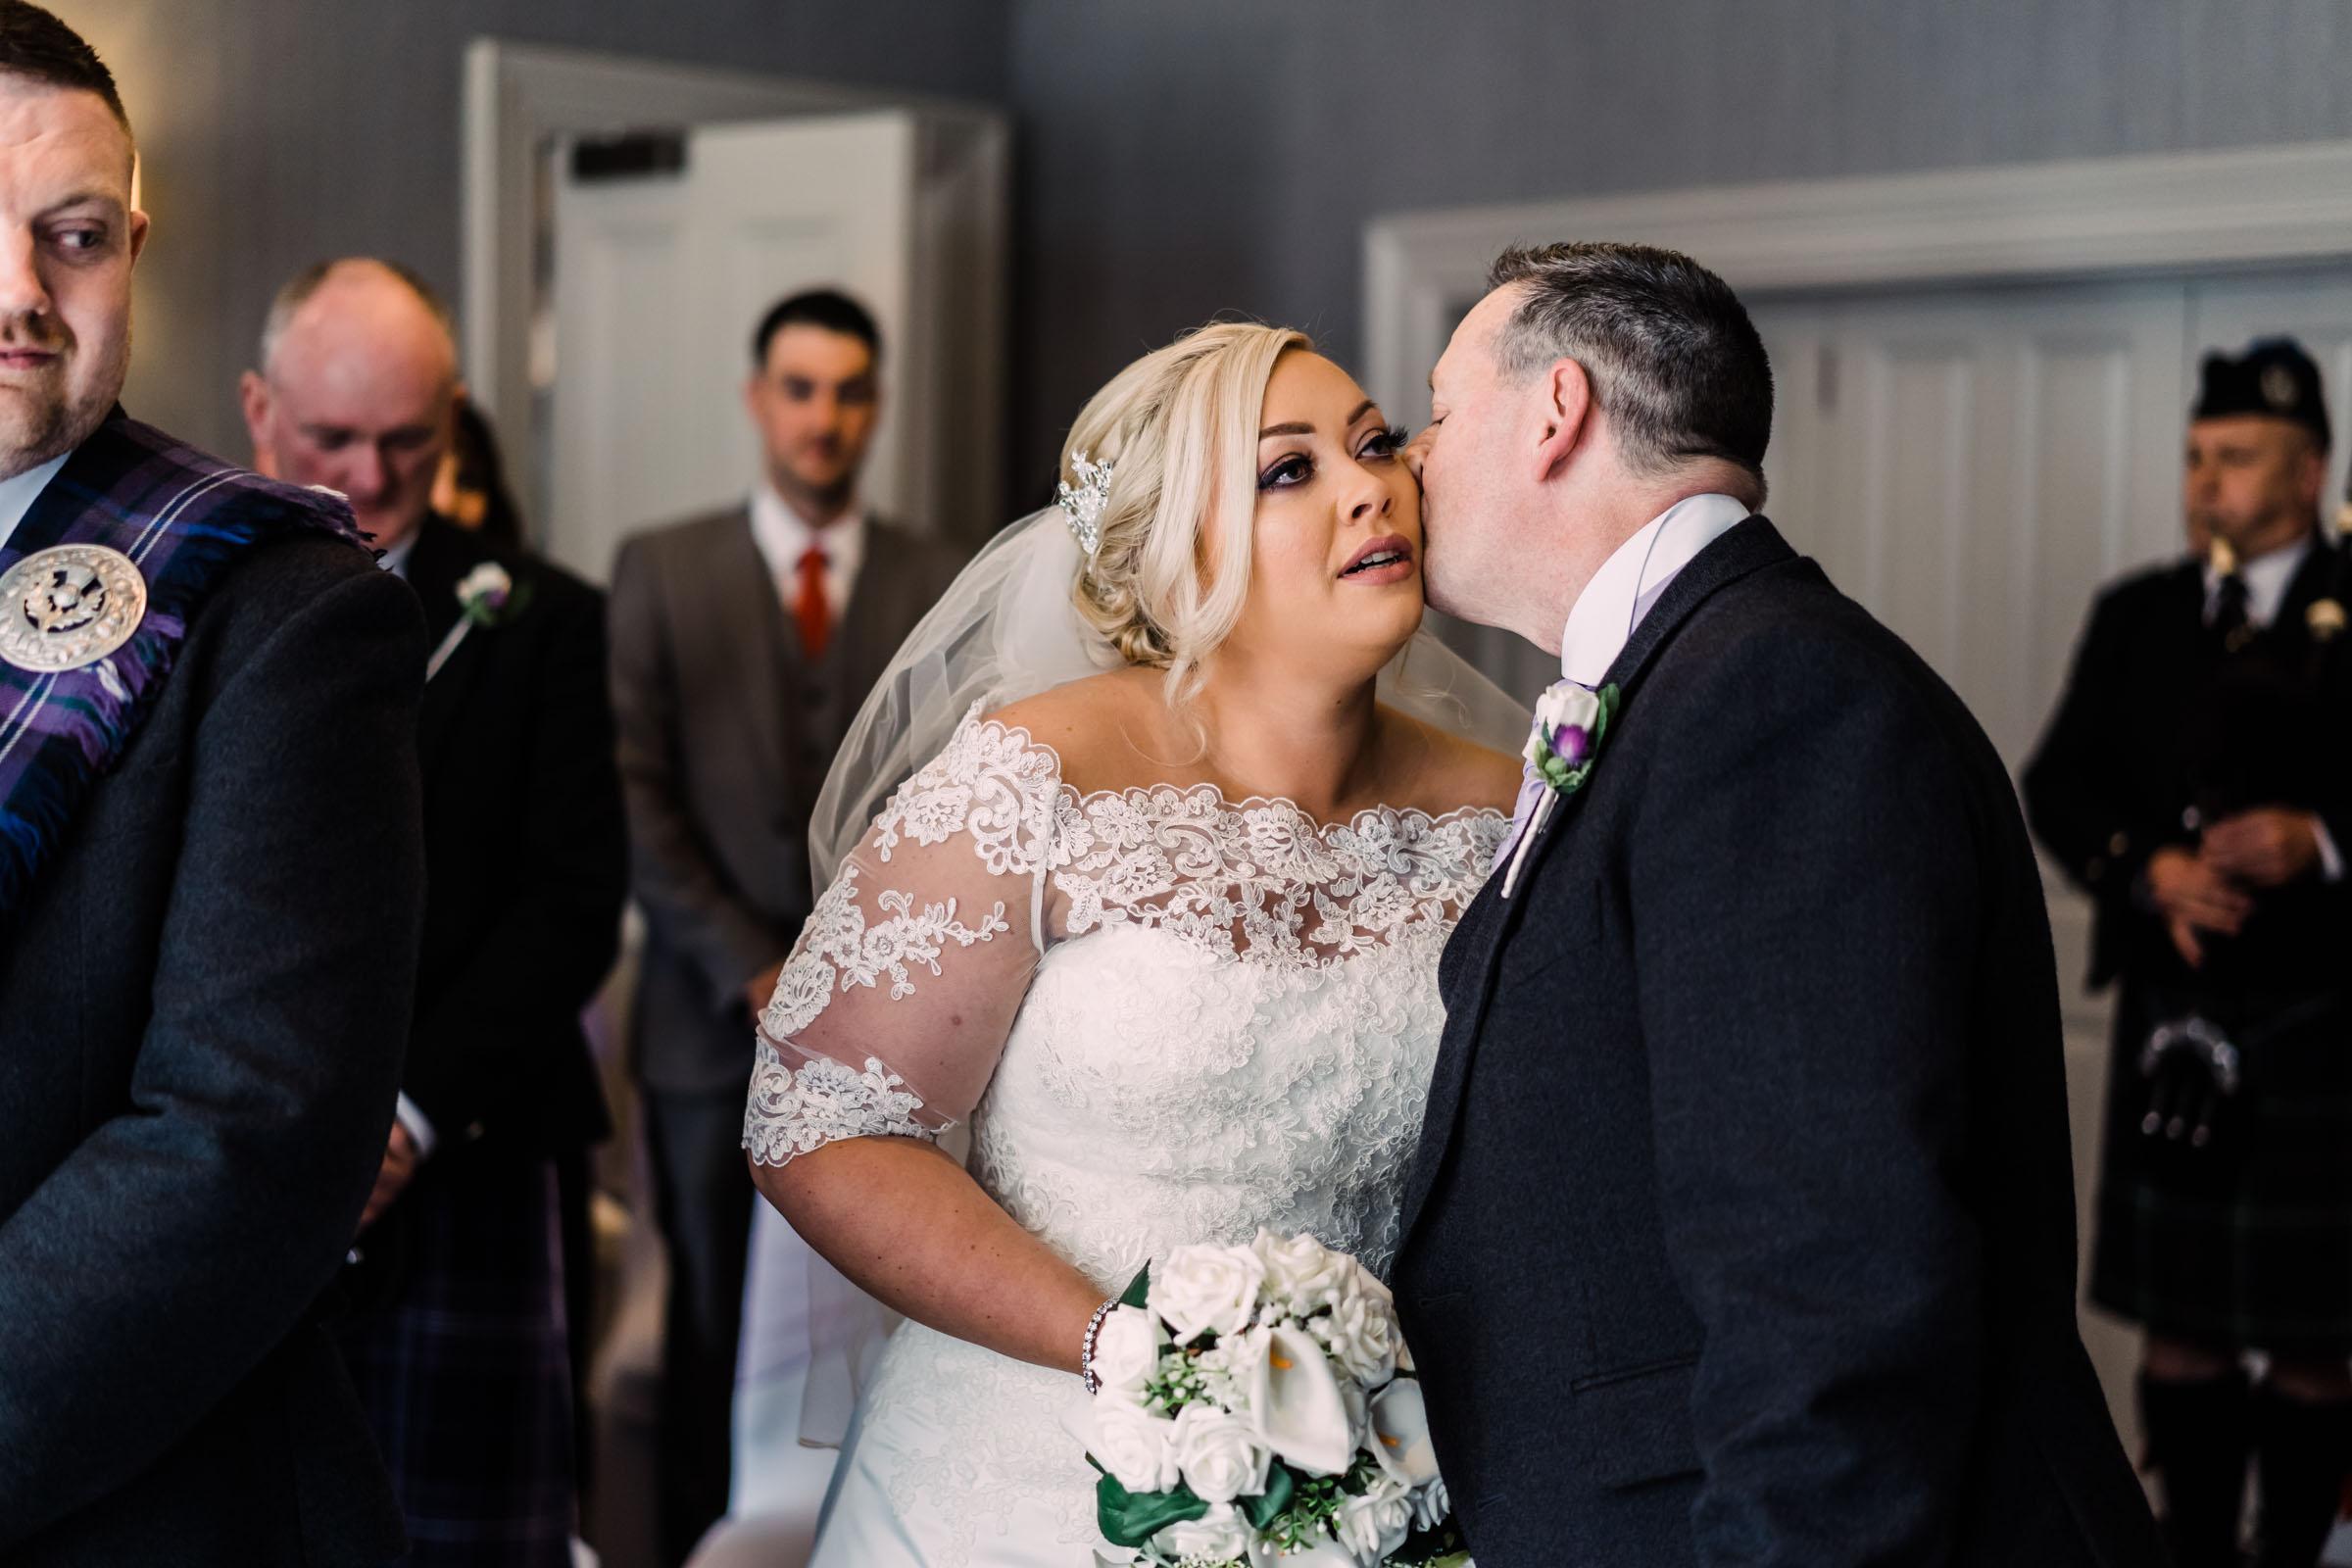 motherwell-moorings-wedding-photographer-dearlyphotography (31 of 77).jpg